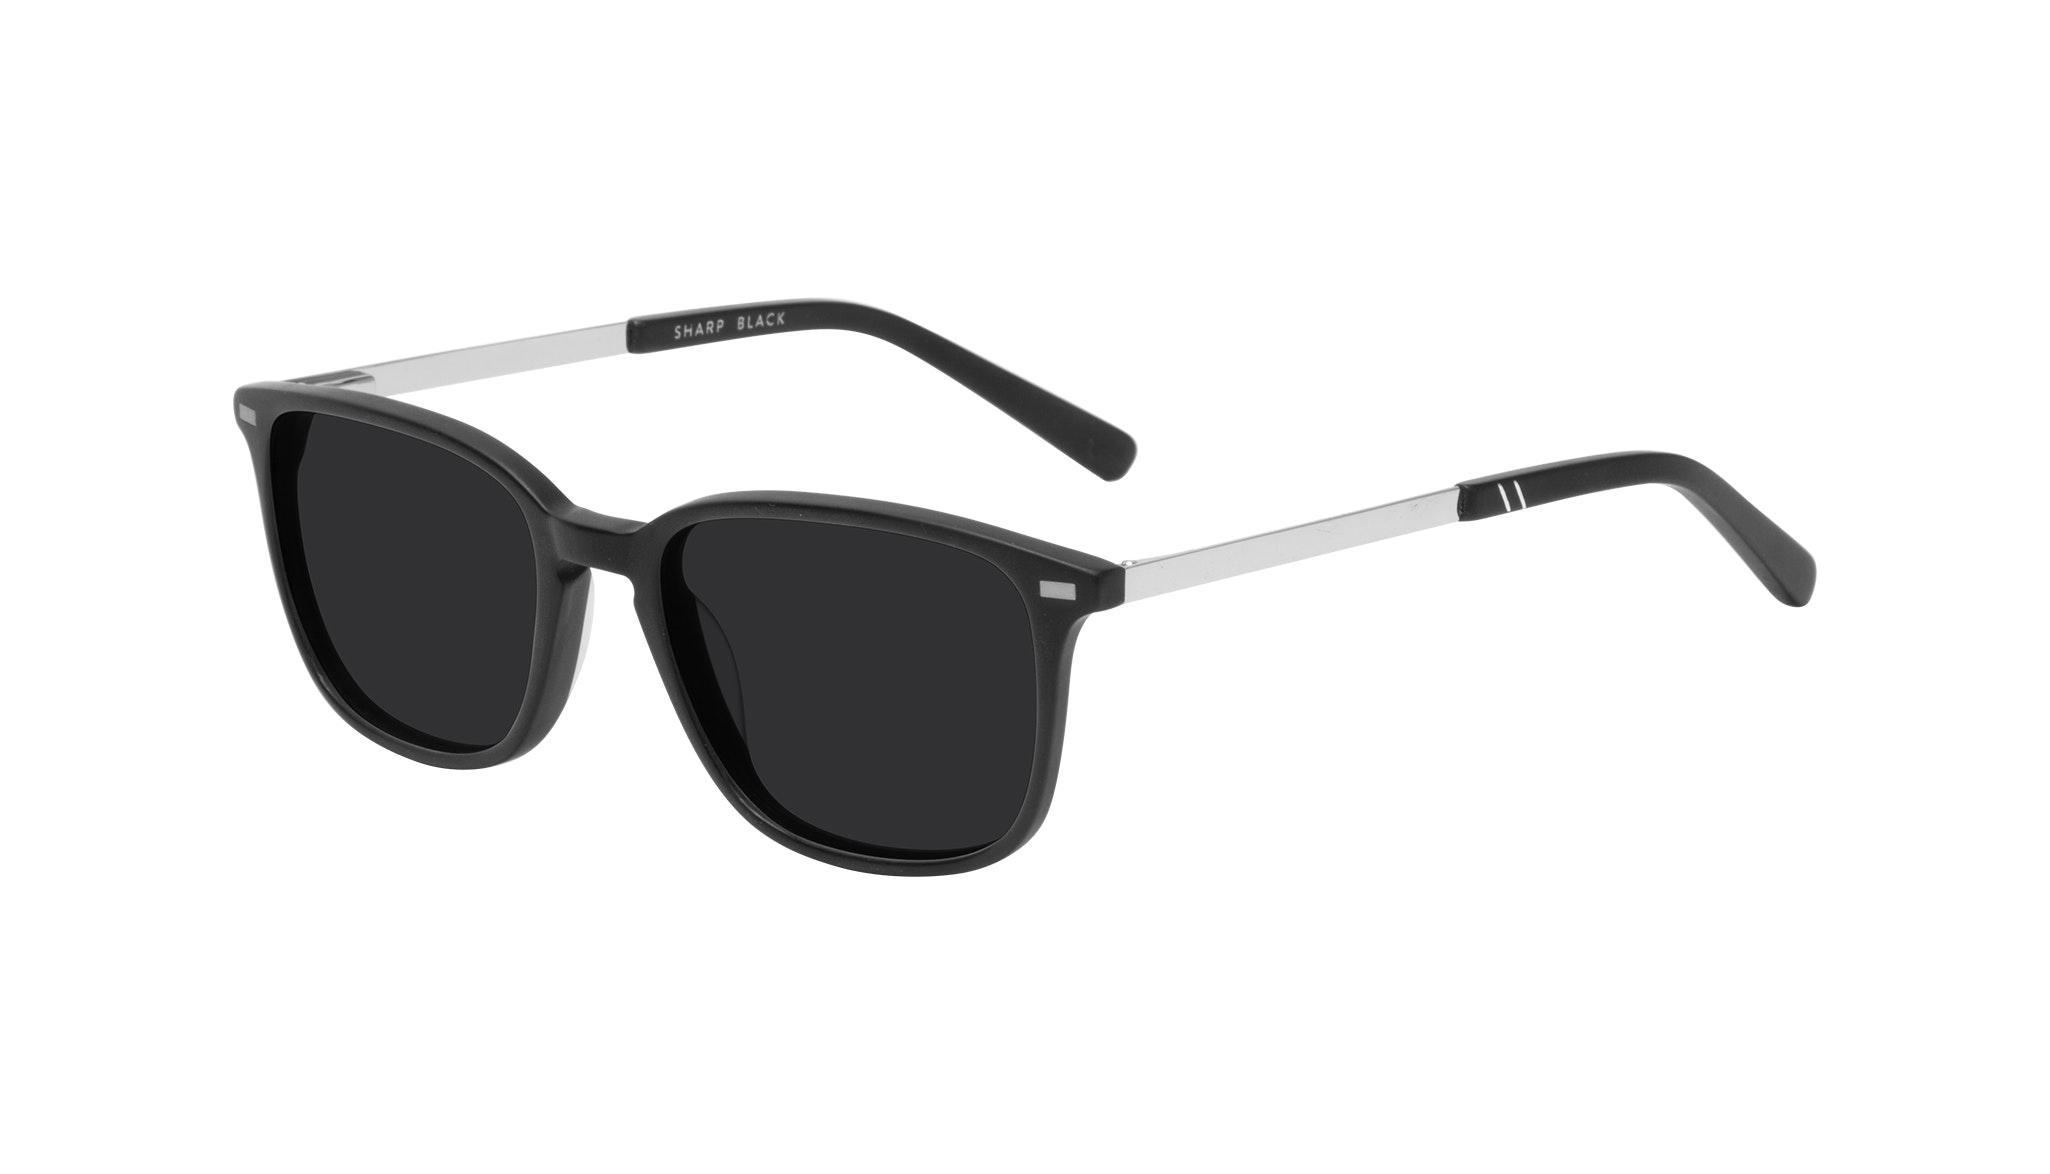 Affordable Fashion Glasses Rectangle Sunglasses Men Sharp Matte Black Tilt